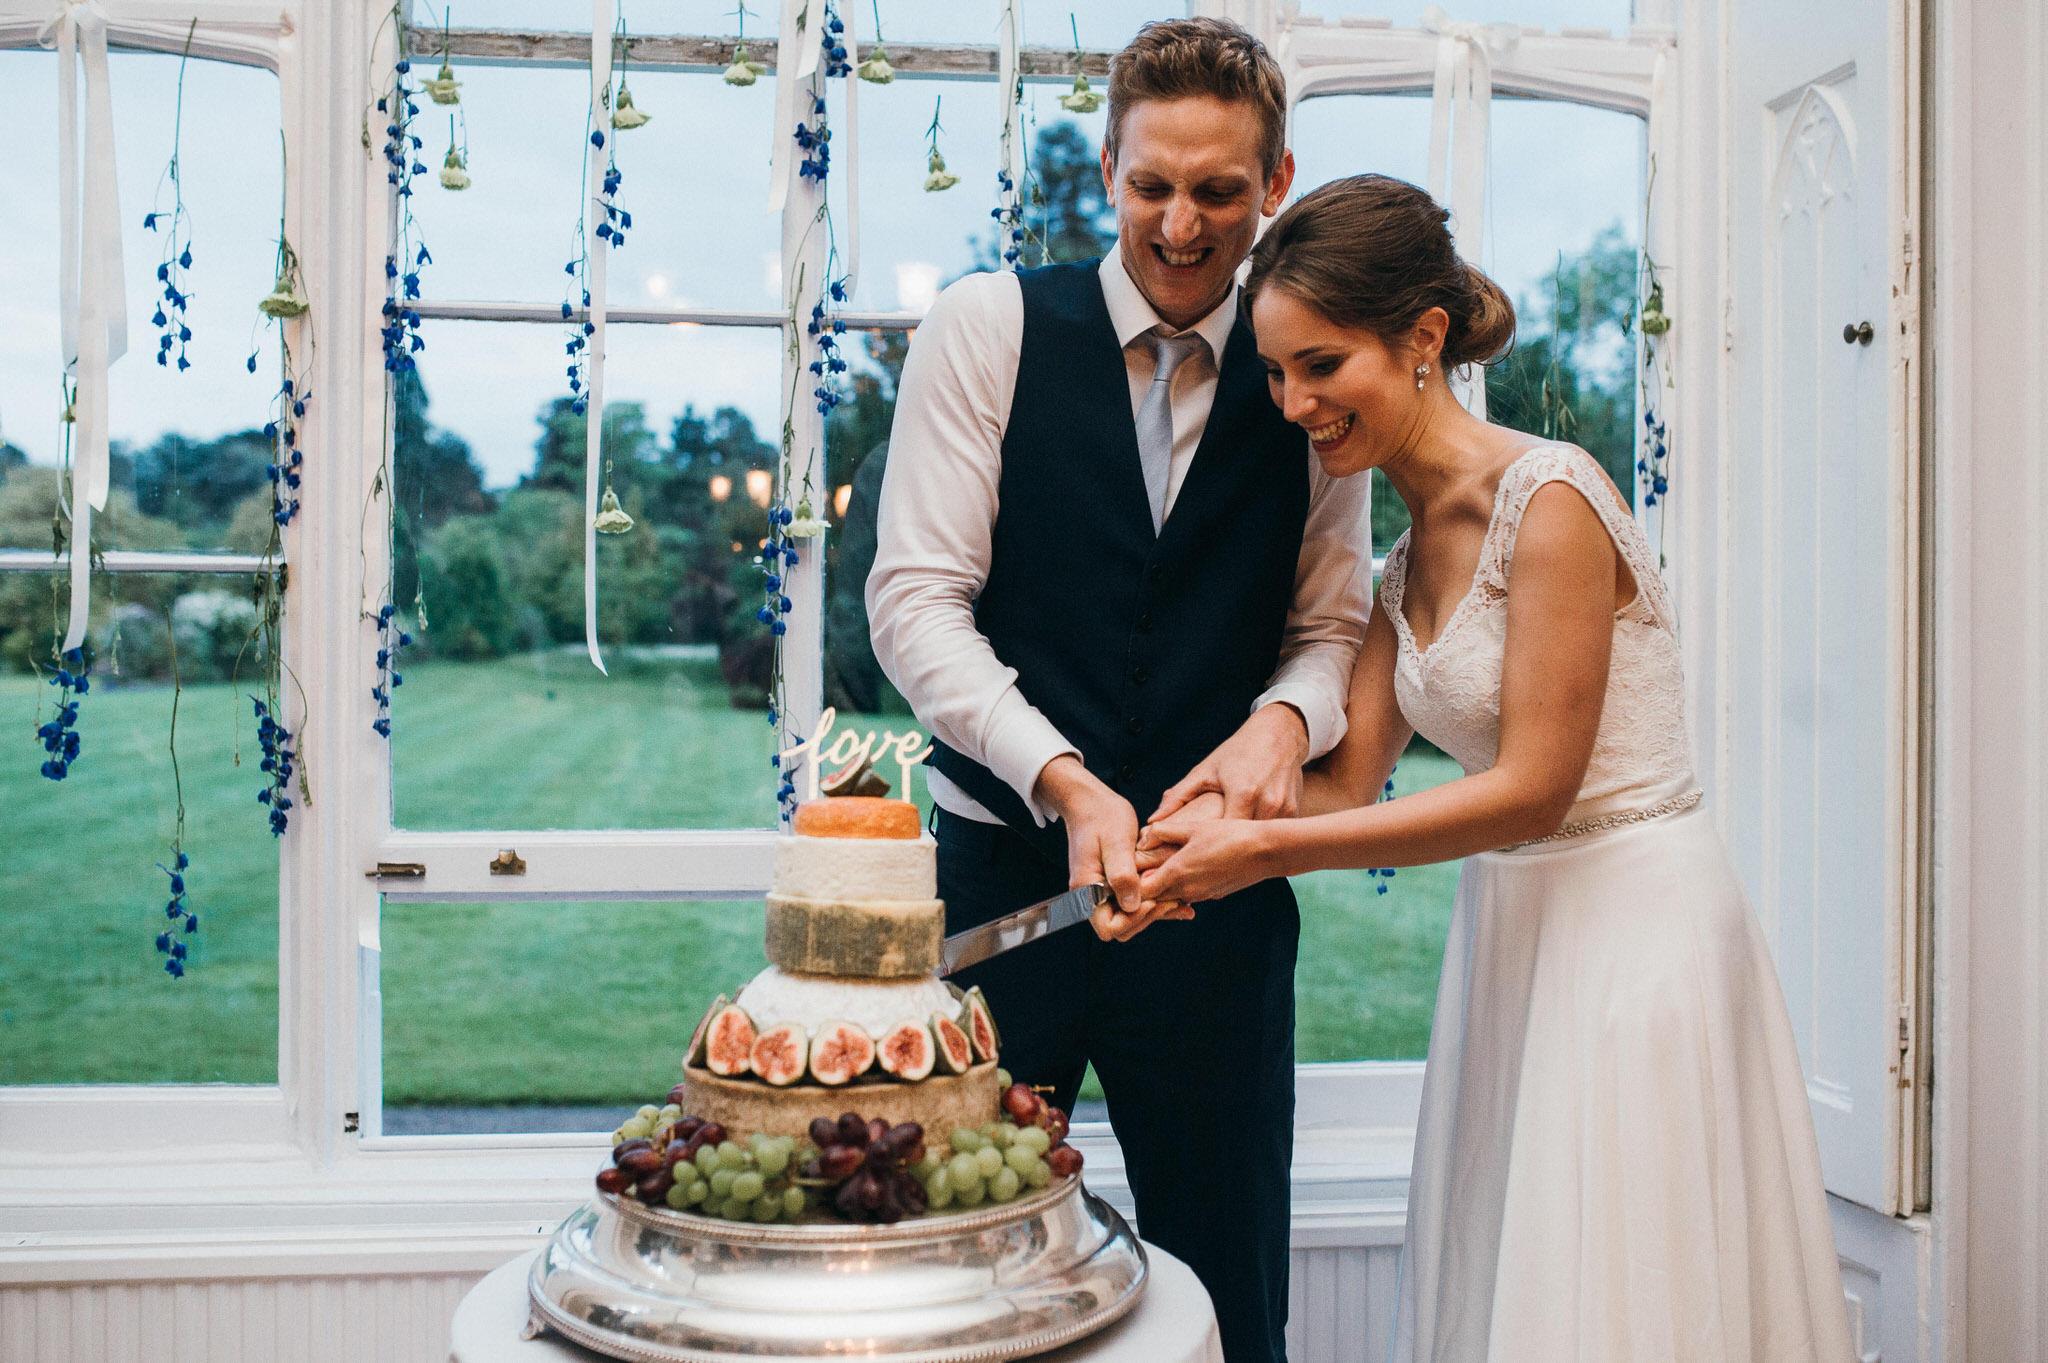 Cake cut Nonsuch Mansion wedding